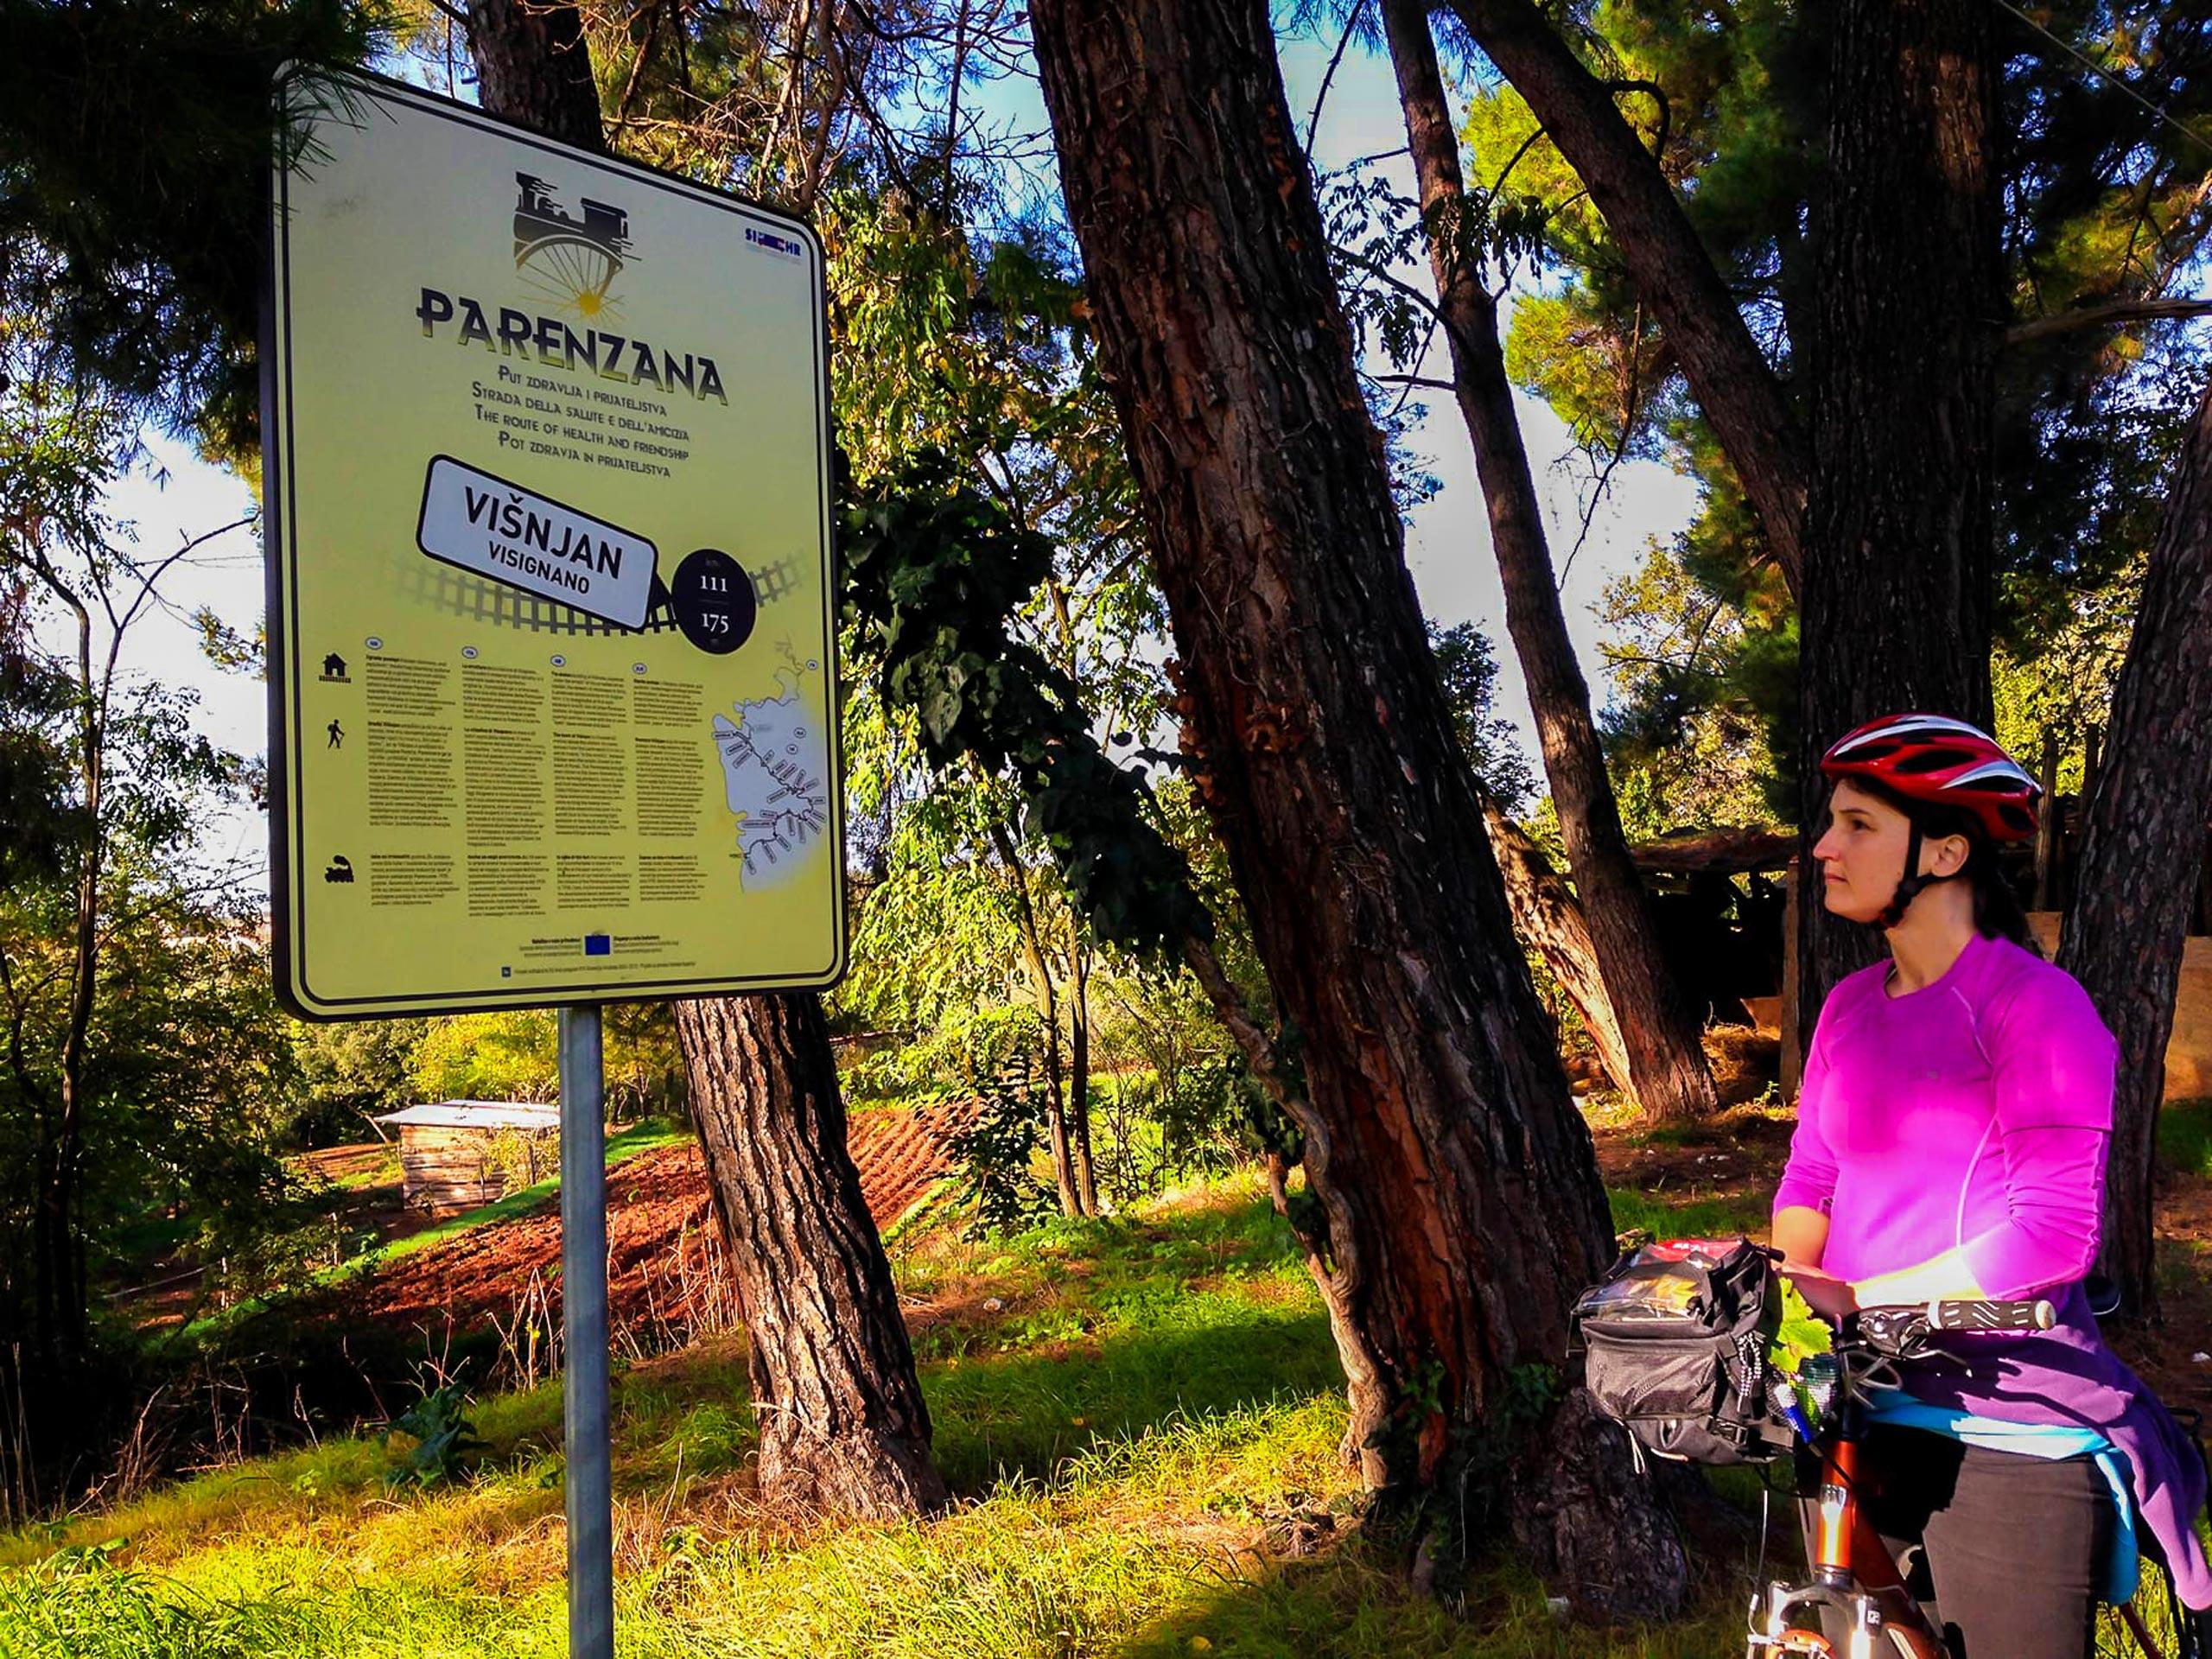 Parenzana information stand